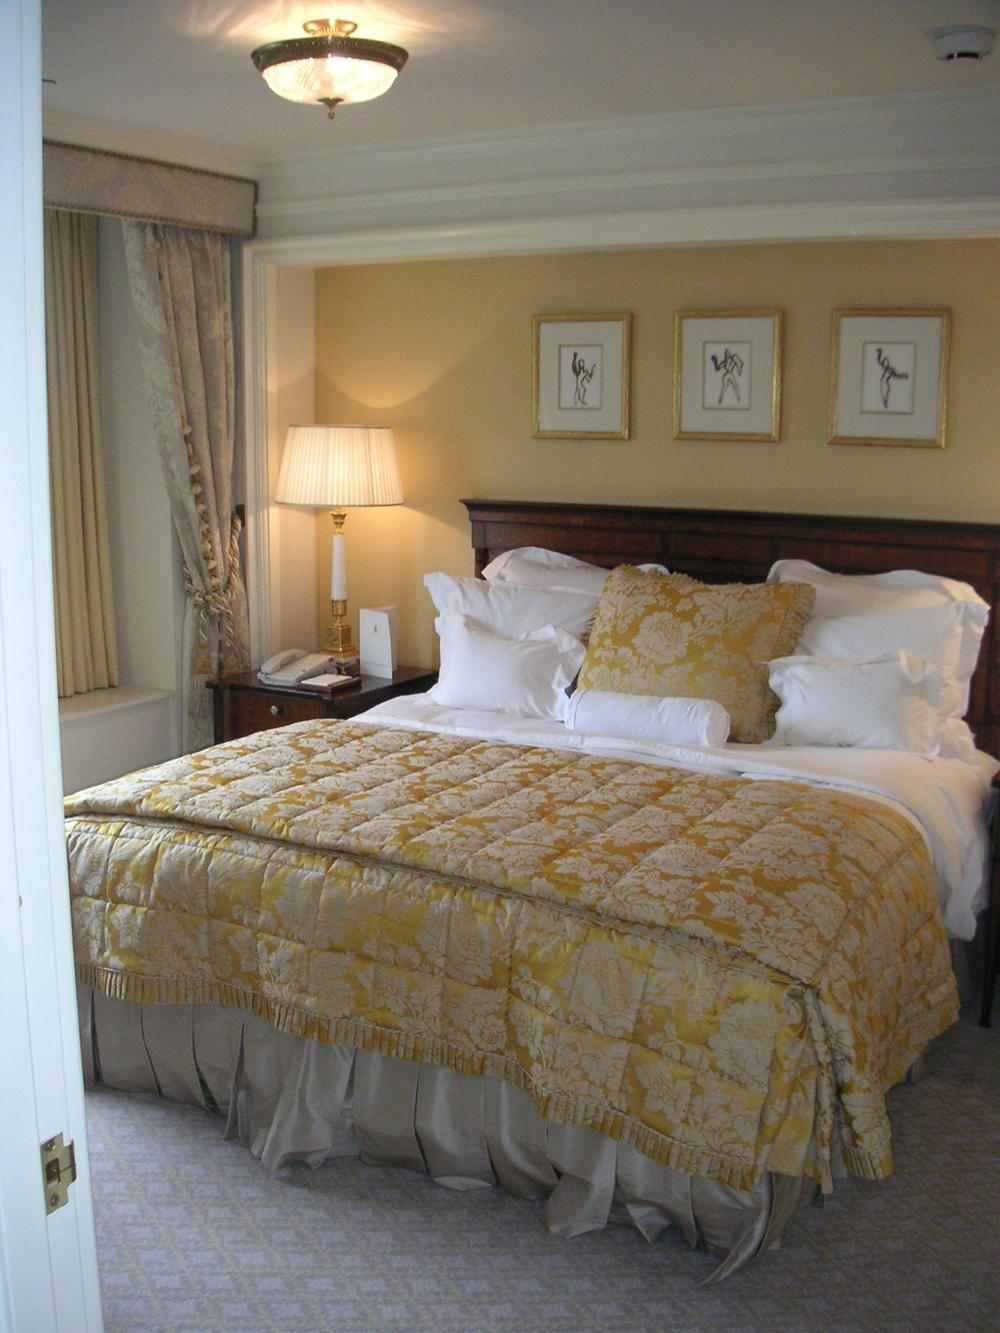 HOTEL 24-07.JPG